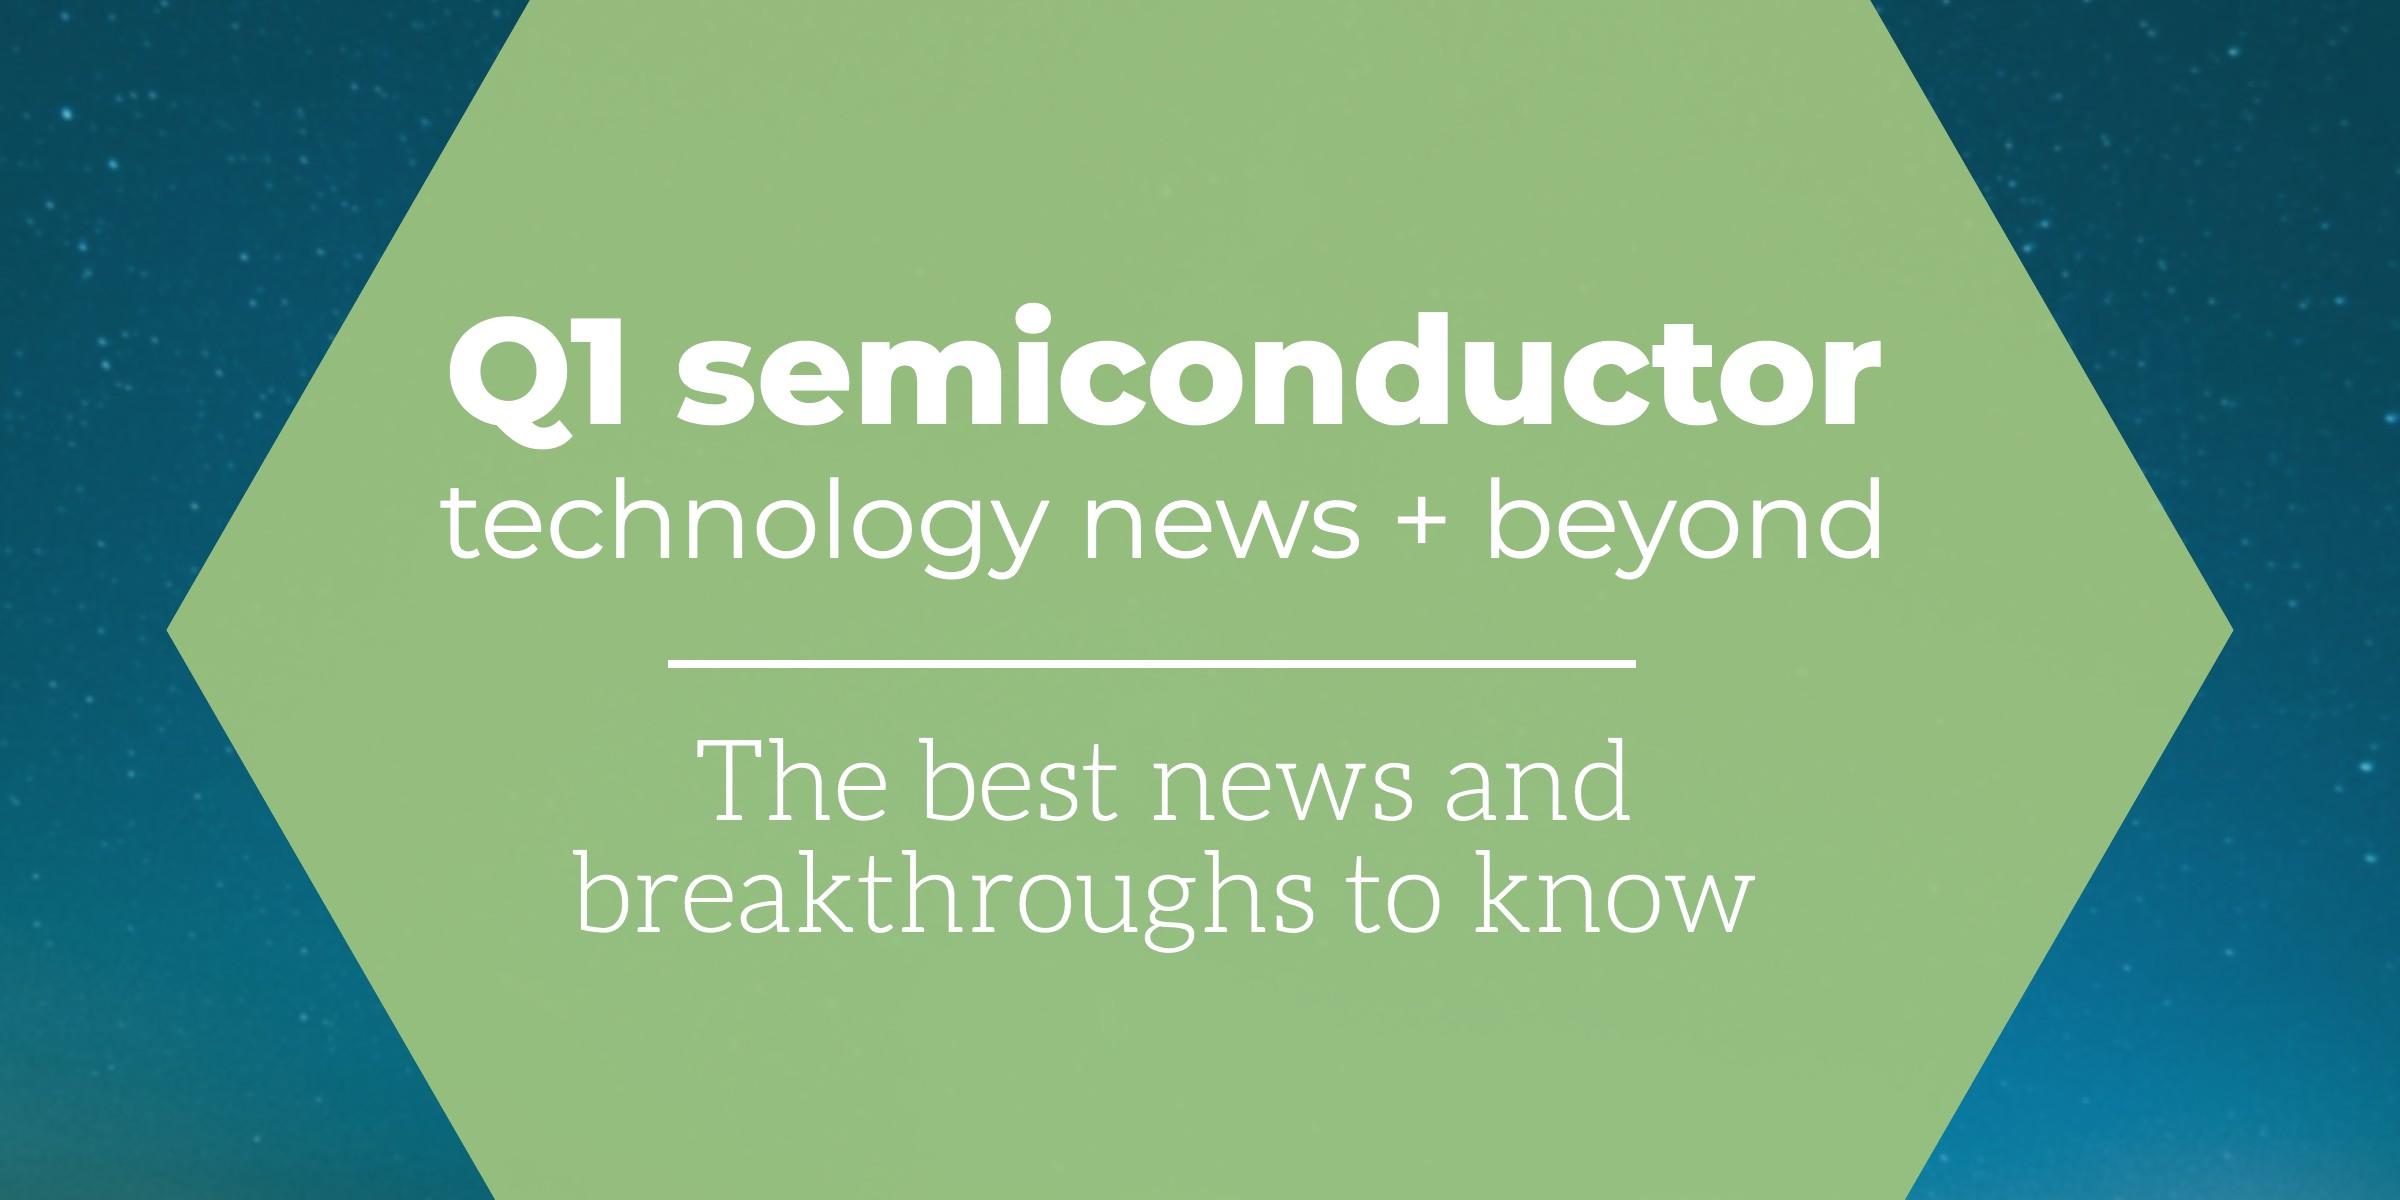 q1-2020-semiconductor-news